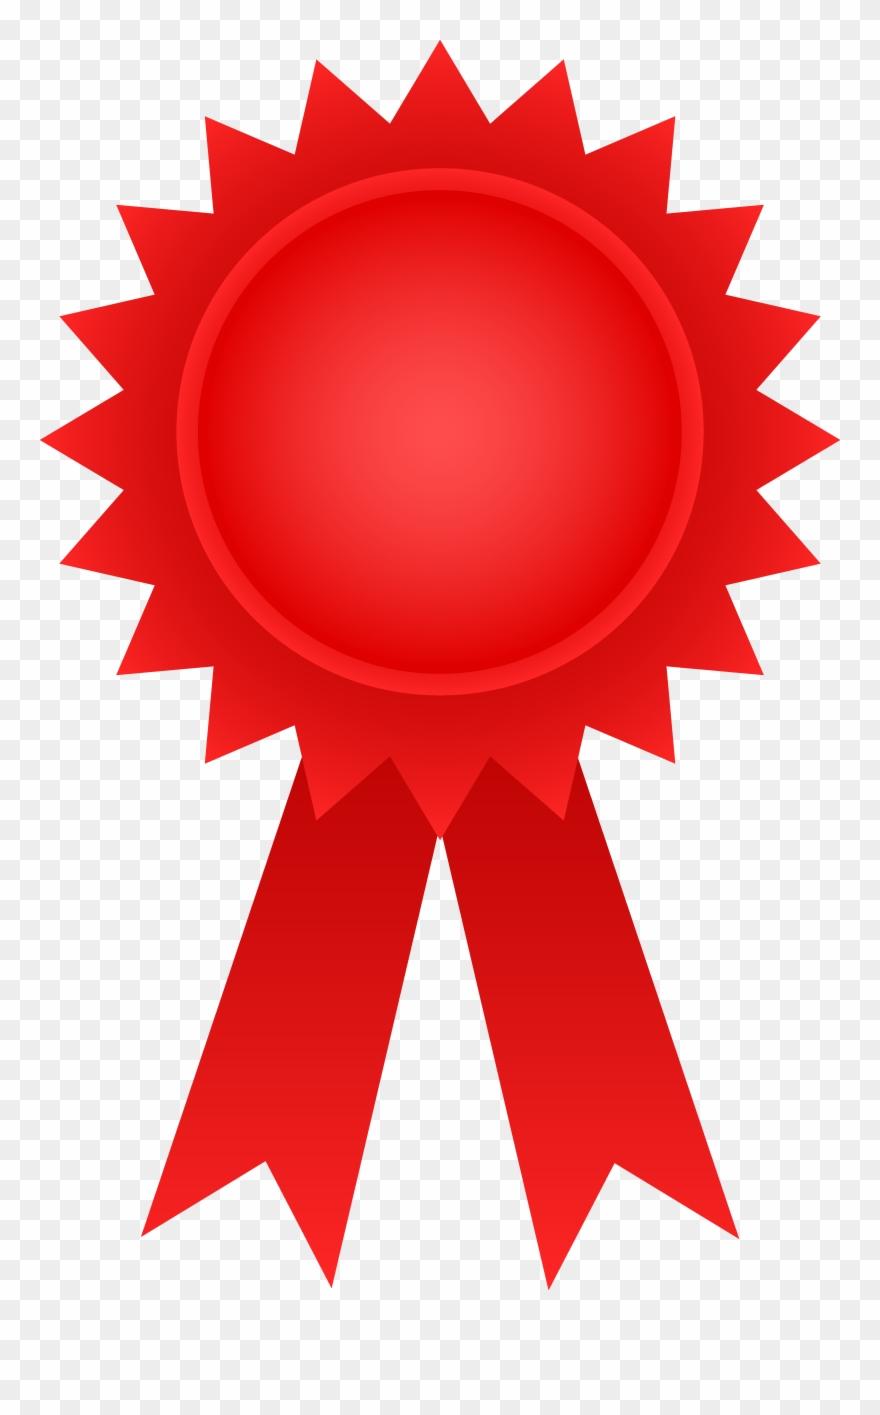 Award ribbon clipart clipart transparent Red Award Ribbon - Award Ribbon Clipart - Png Download (#11479 ... clipart transparent